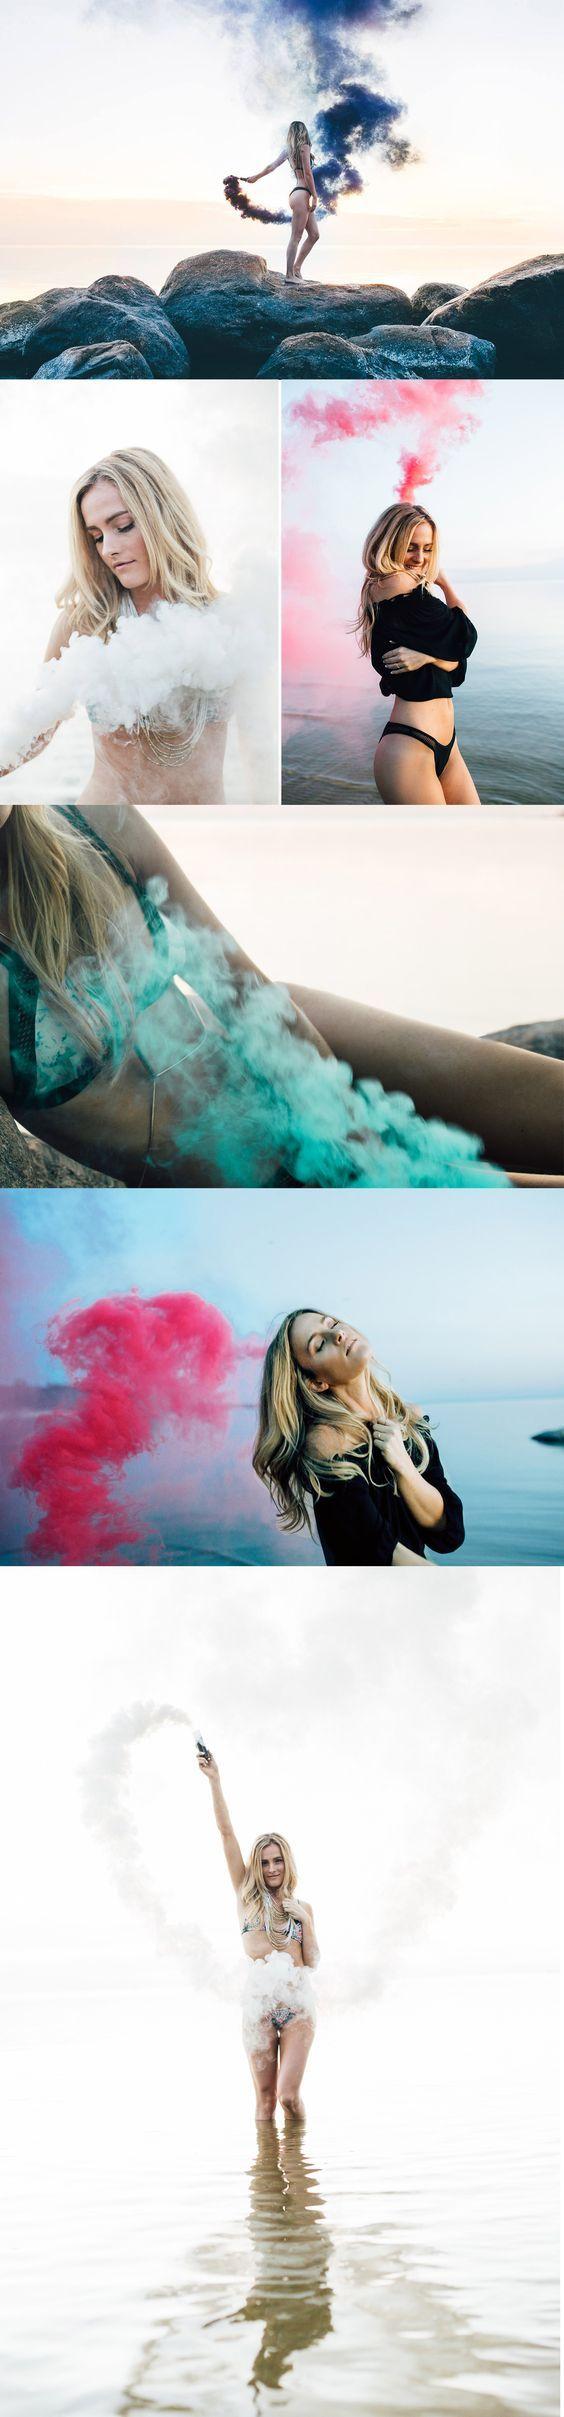 Photoshoot ideas Smoke Bomb Photography Beach